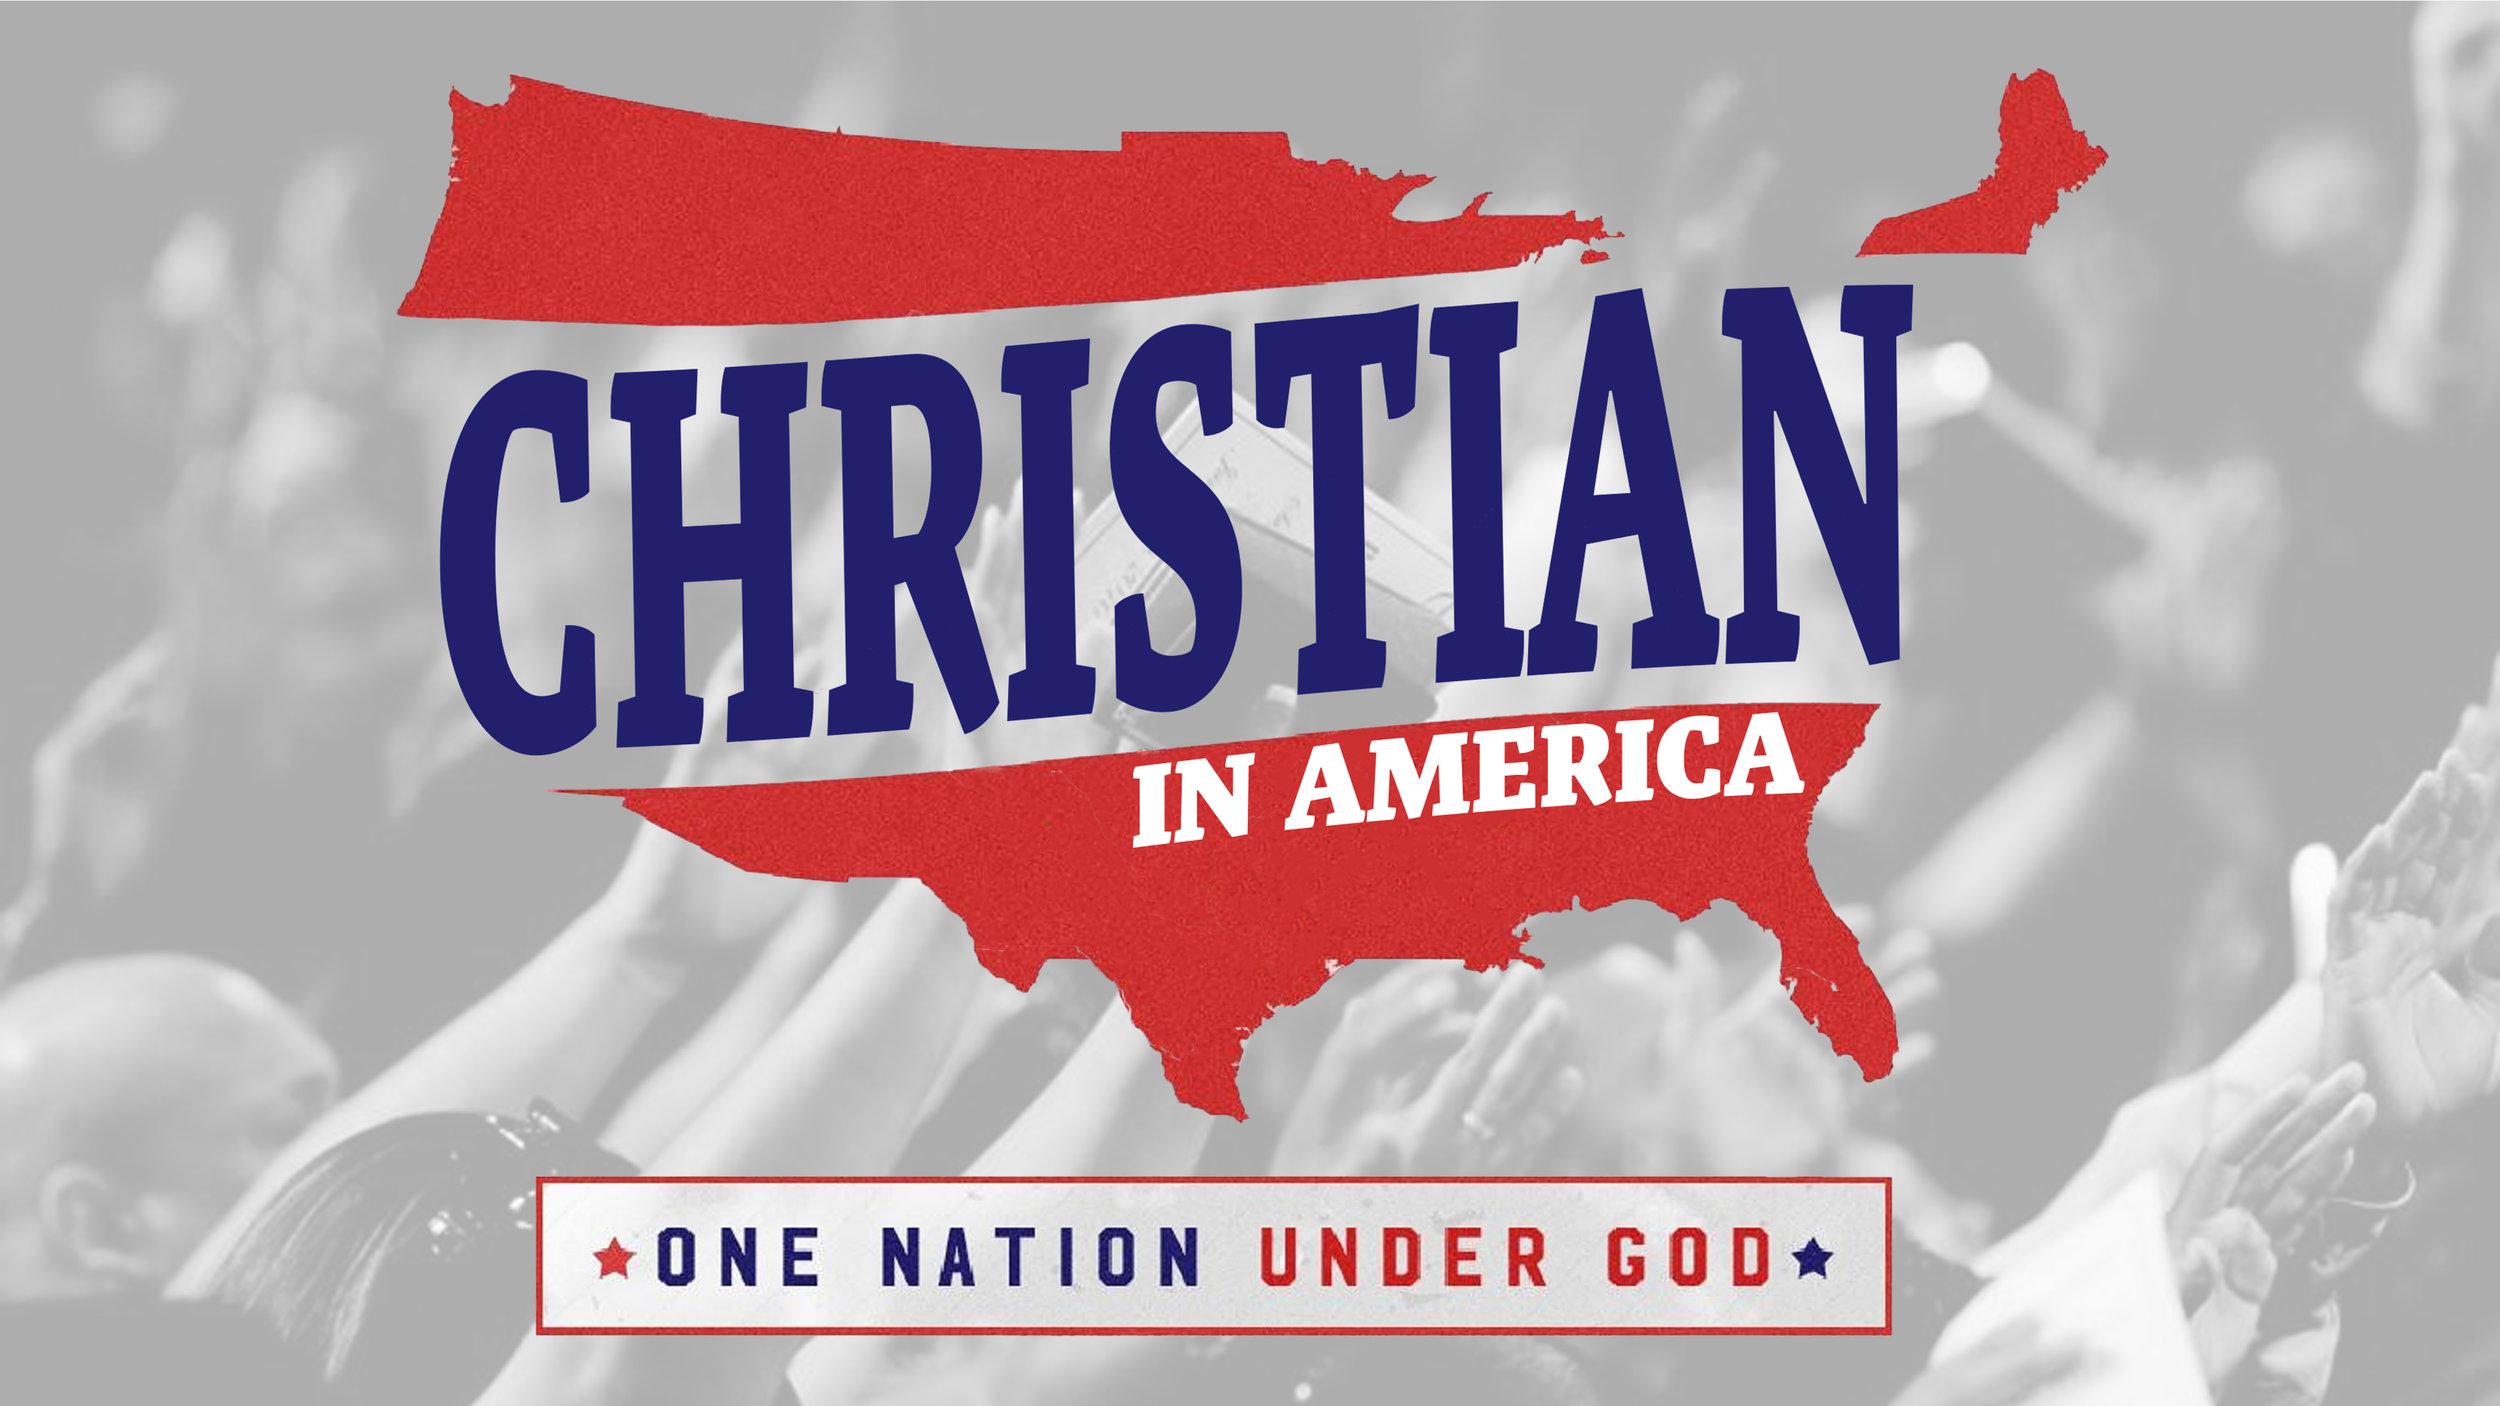 ChristianInAmerica_2.jpg